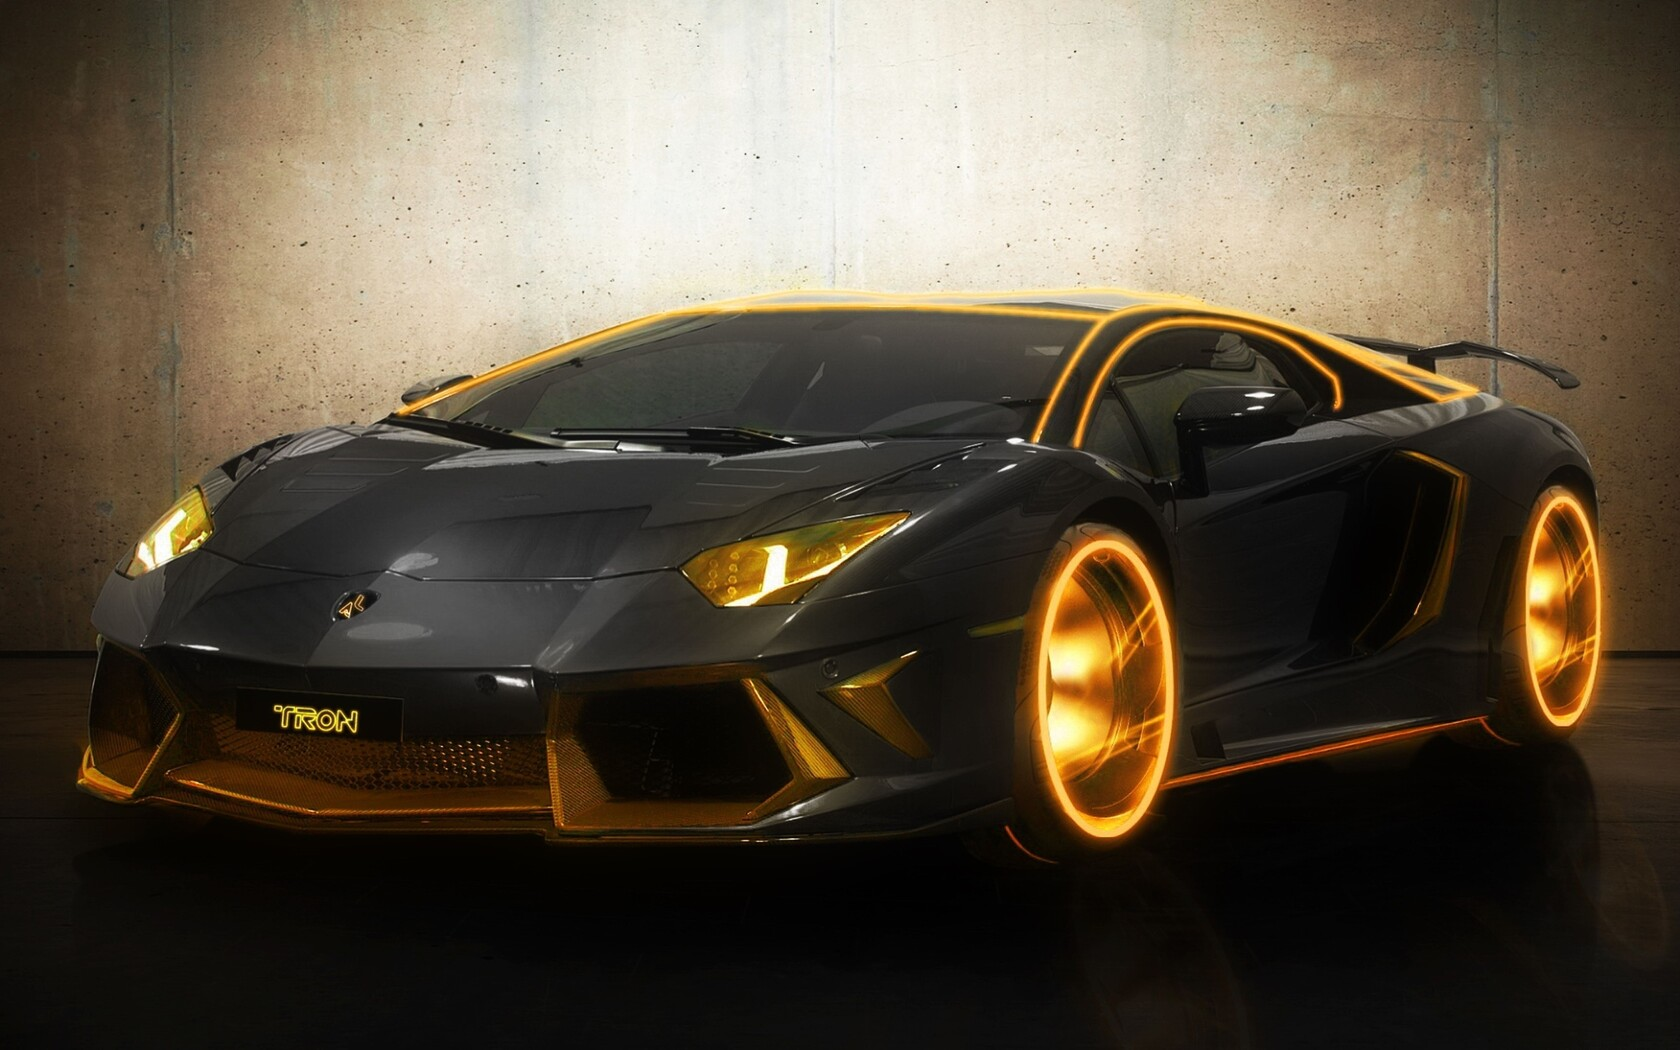 Tron Lamborghini Black Red Car Wallpapers Hd Desktop: 1680x1050 Lamborghini Tron Gold 1680x1050 Resolution HD 4k